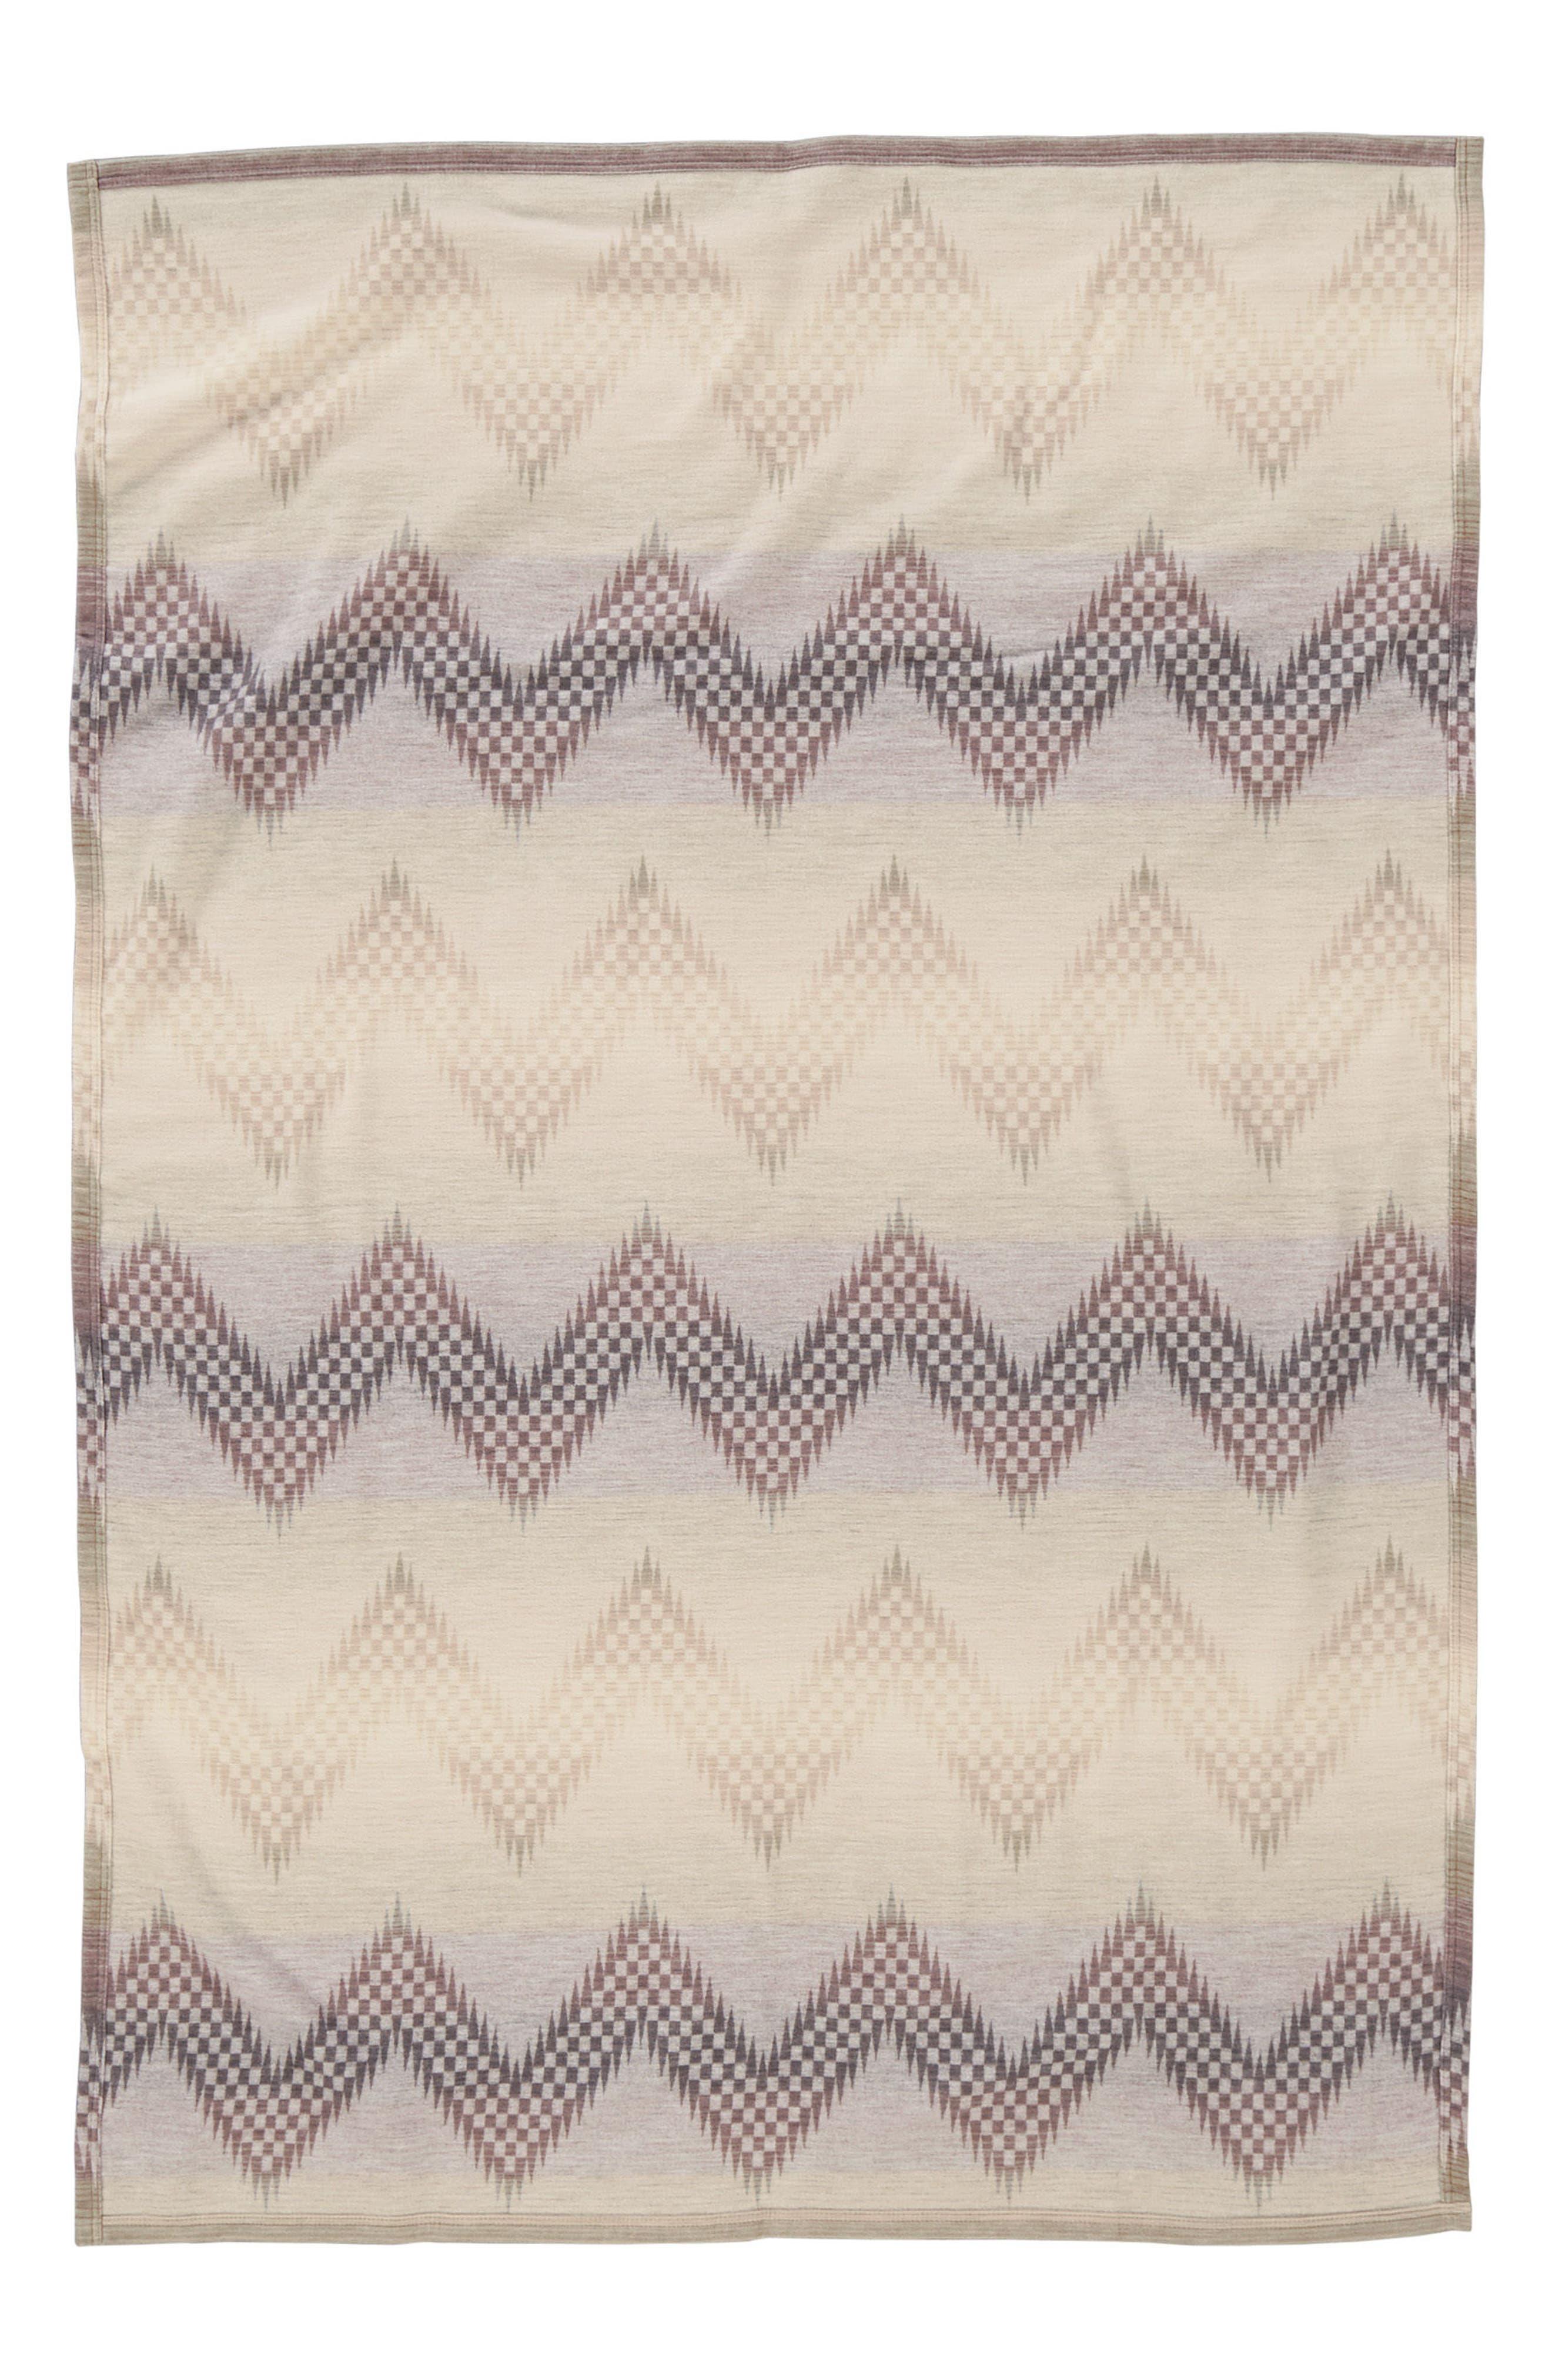 Willow Basket Throw Blanket,                             Alternate thumbnail 2, color,                             250